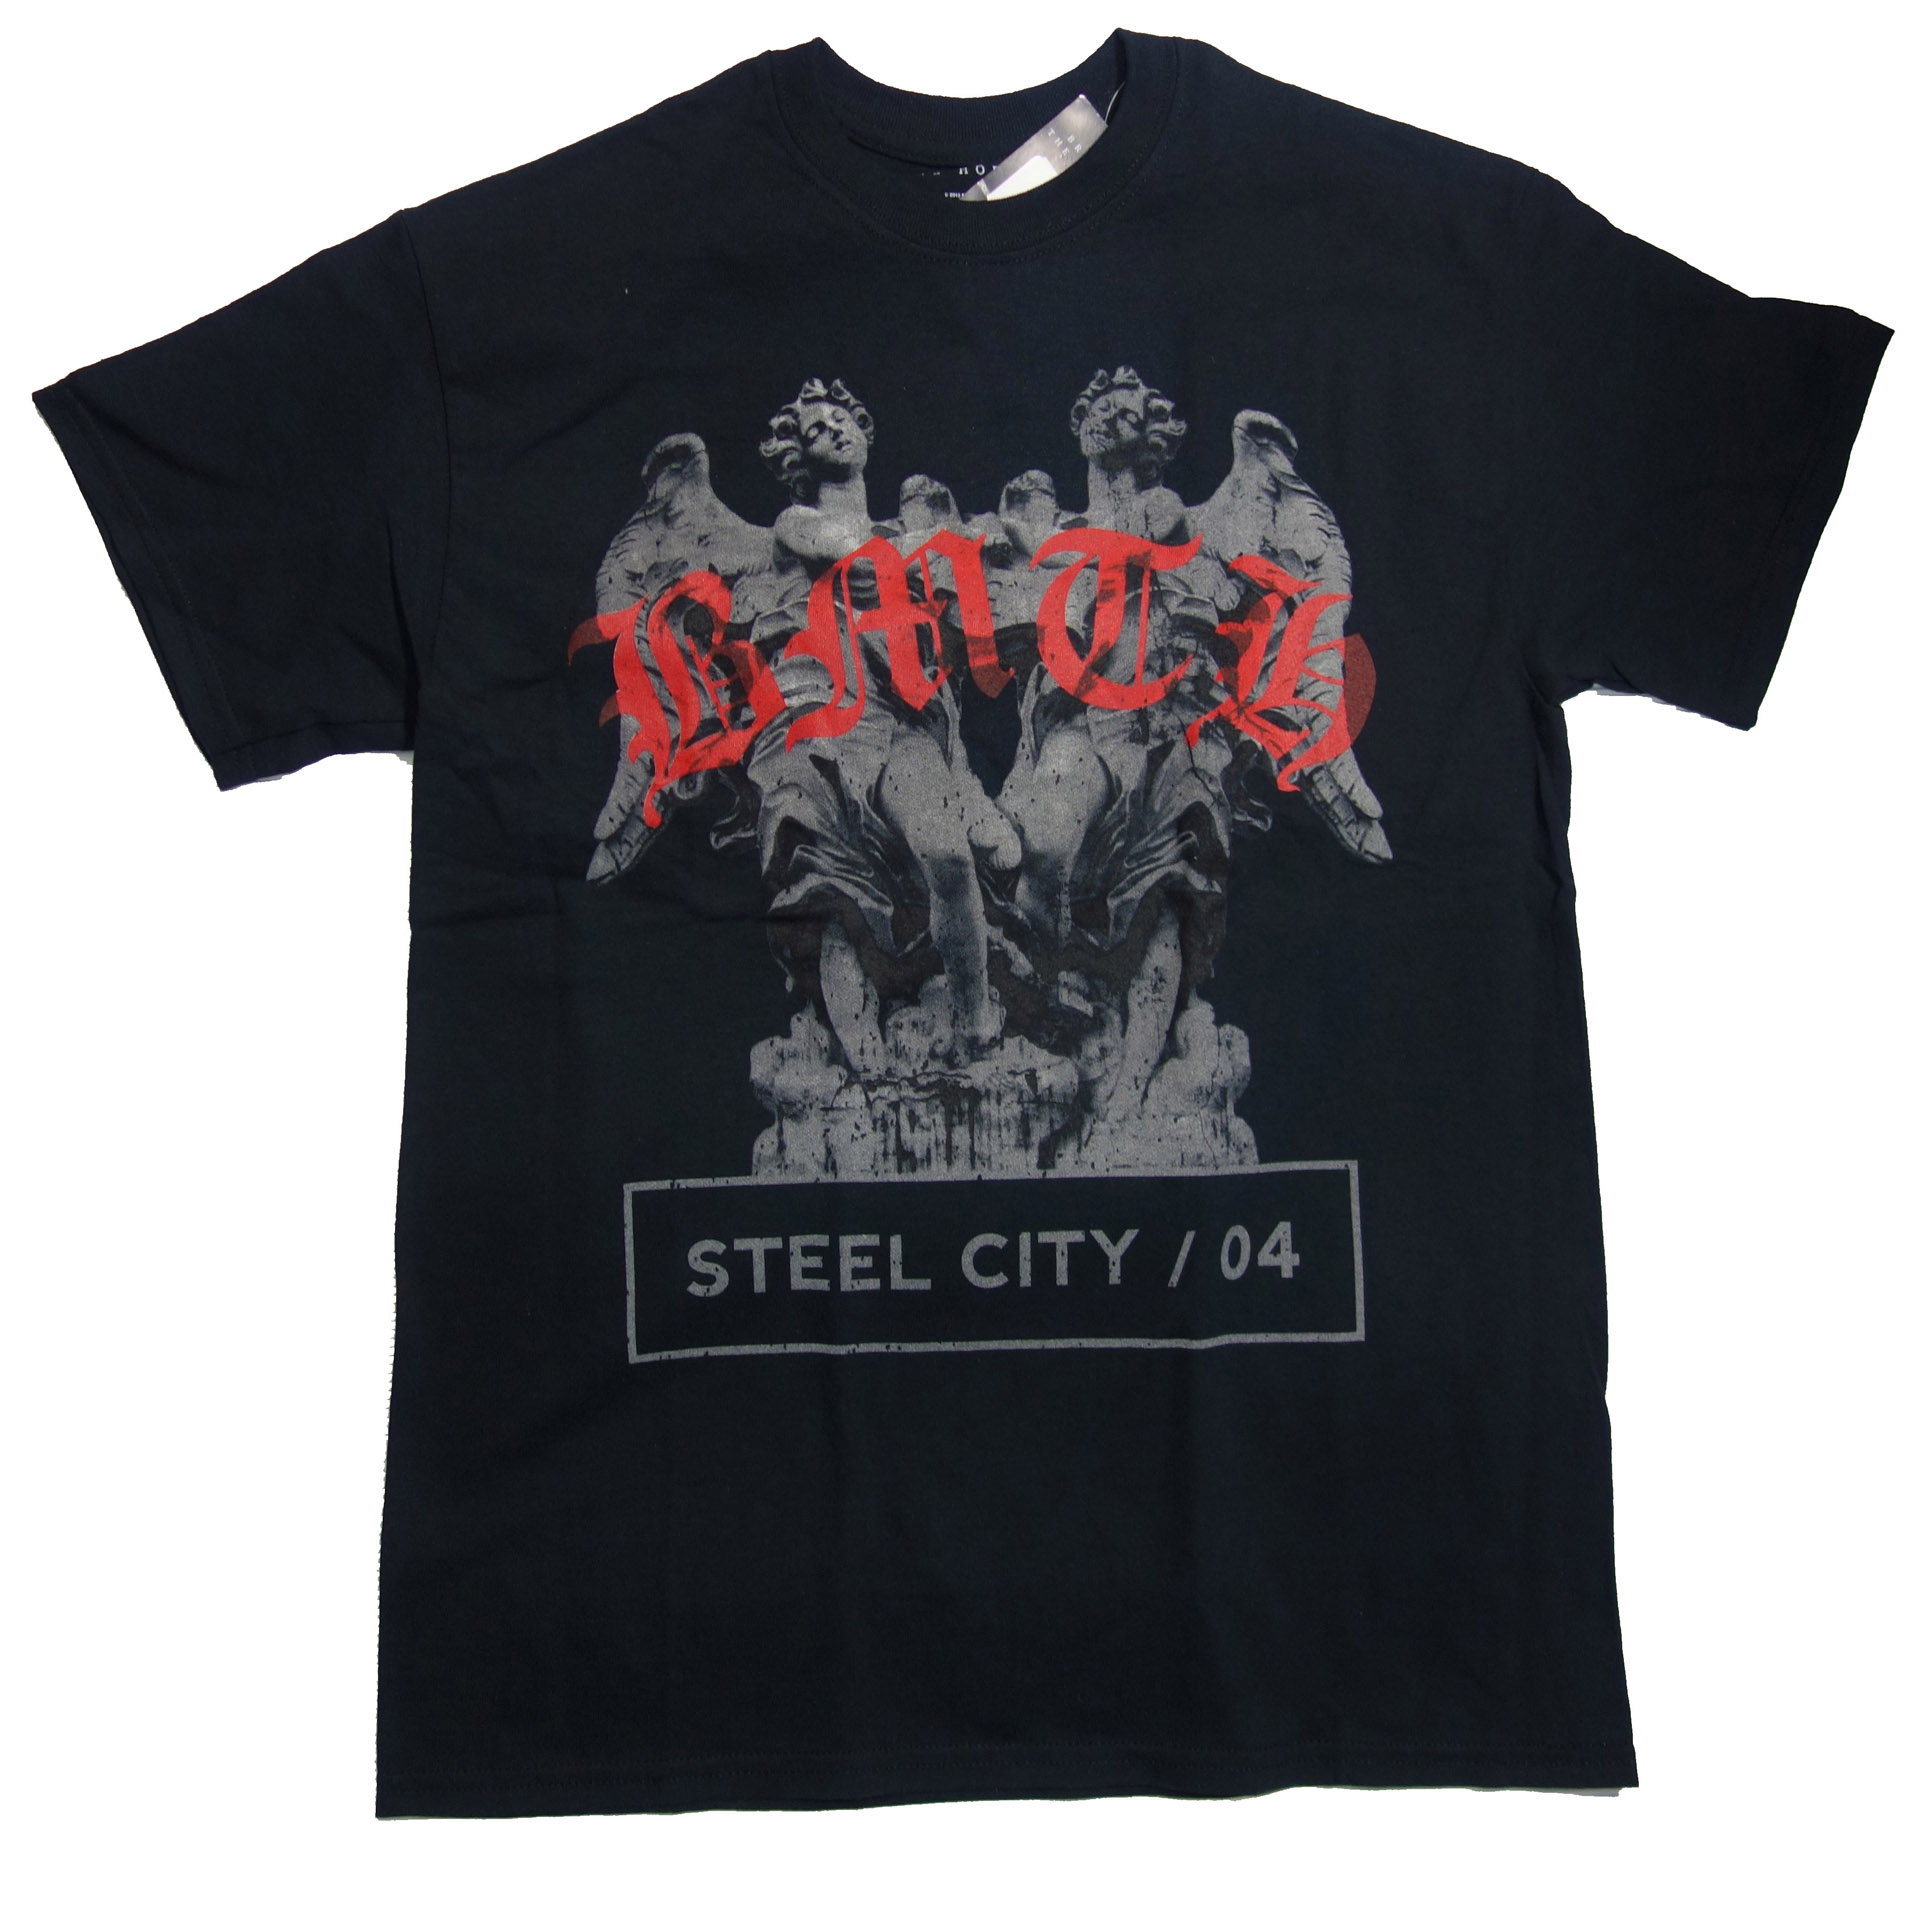 T-Shirt Bring Me The Horizon Steel City / 04